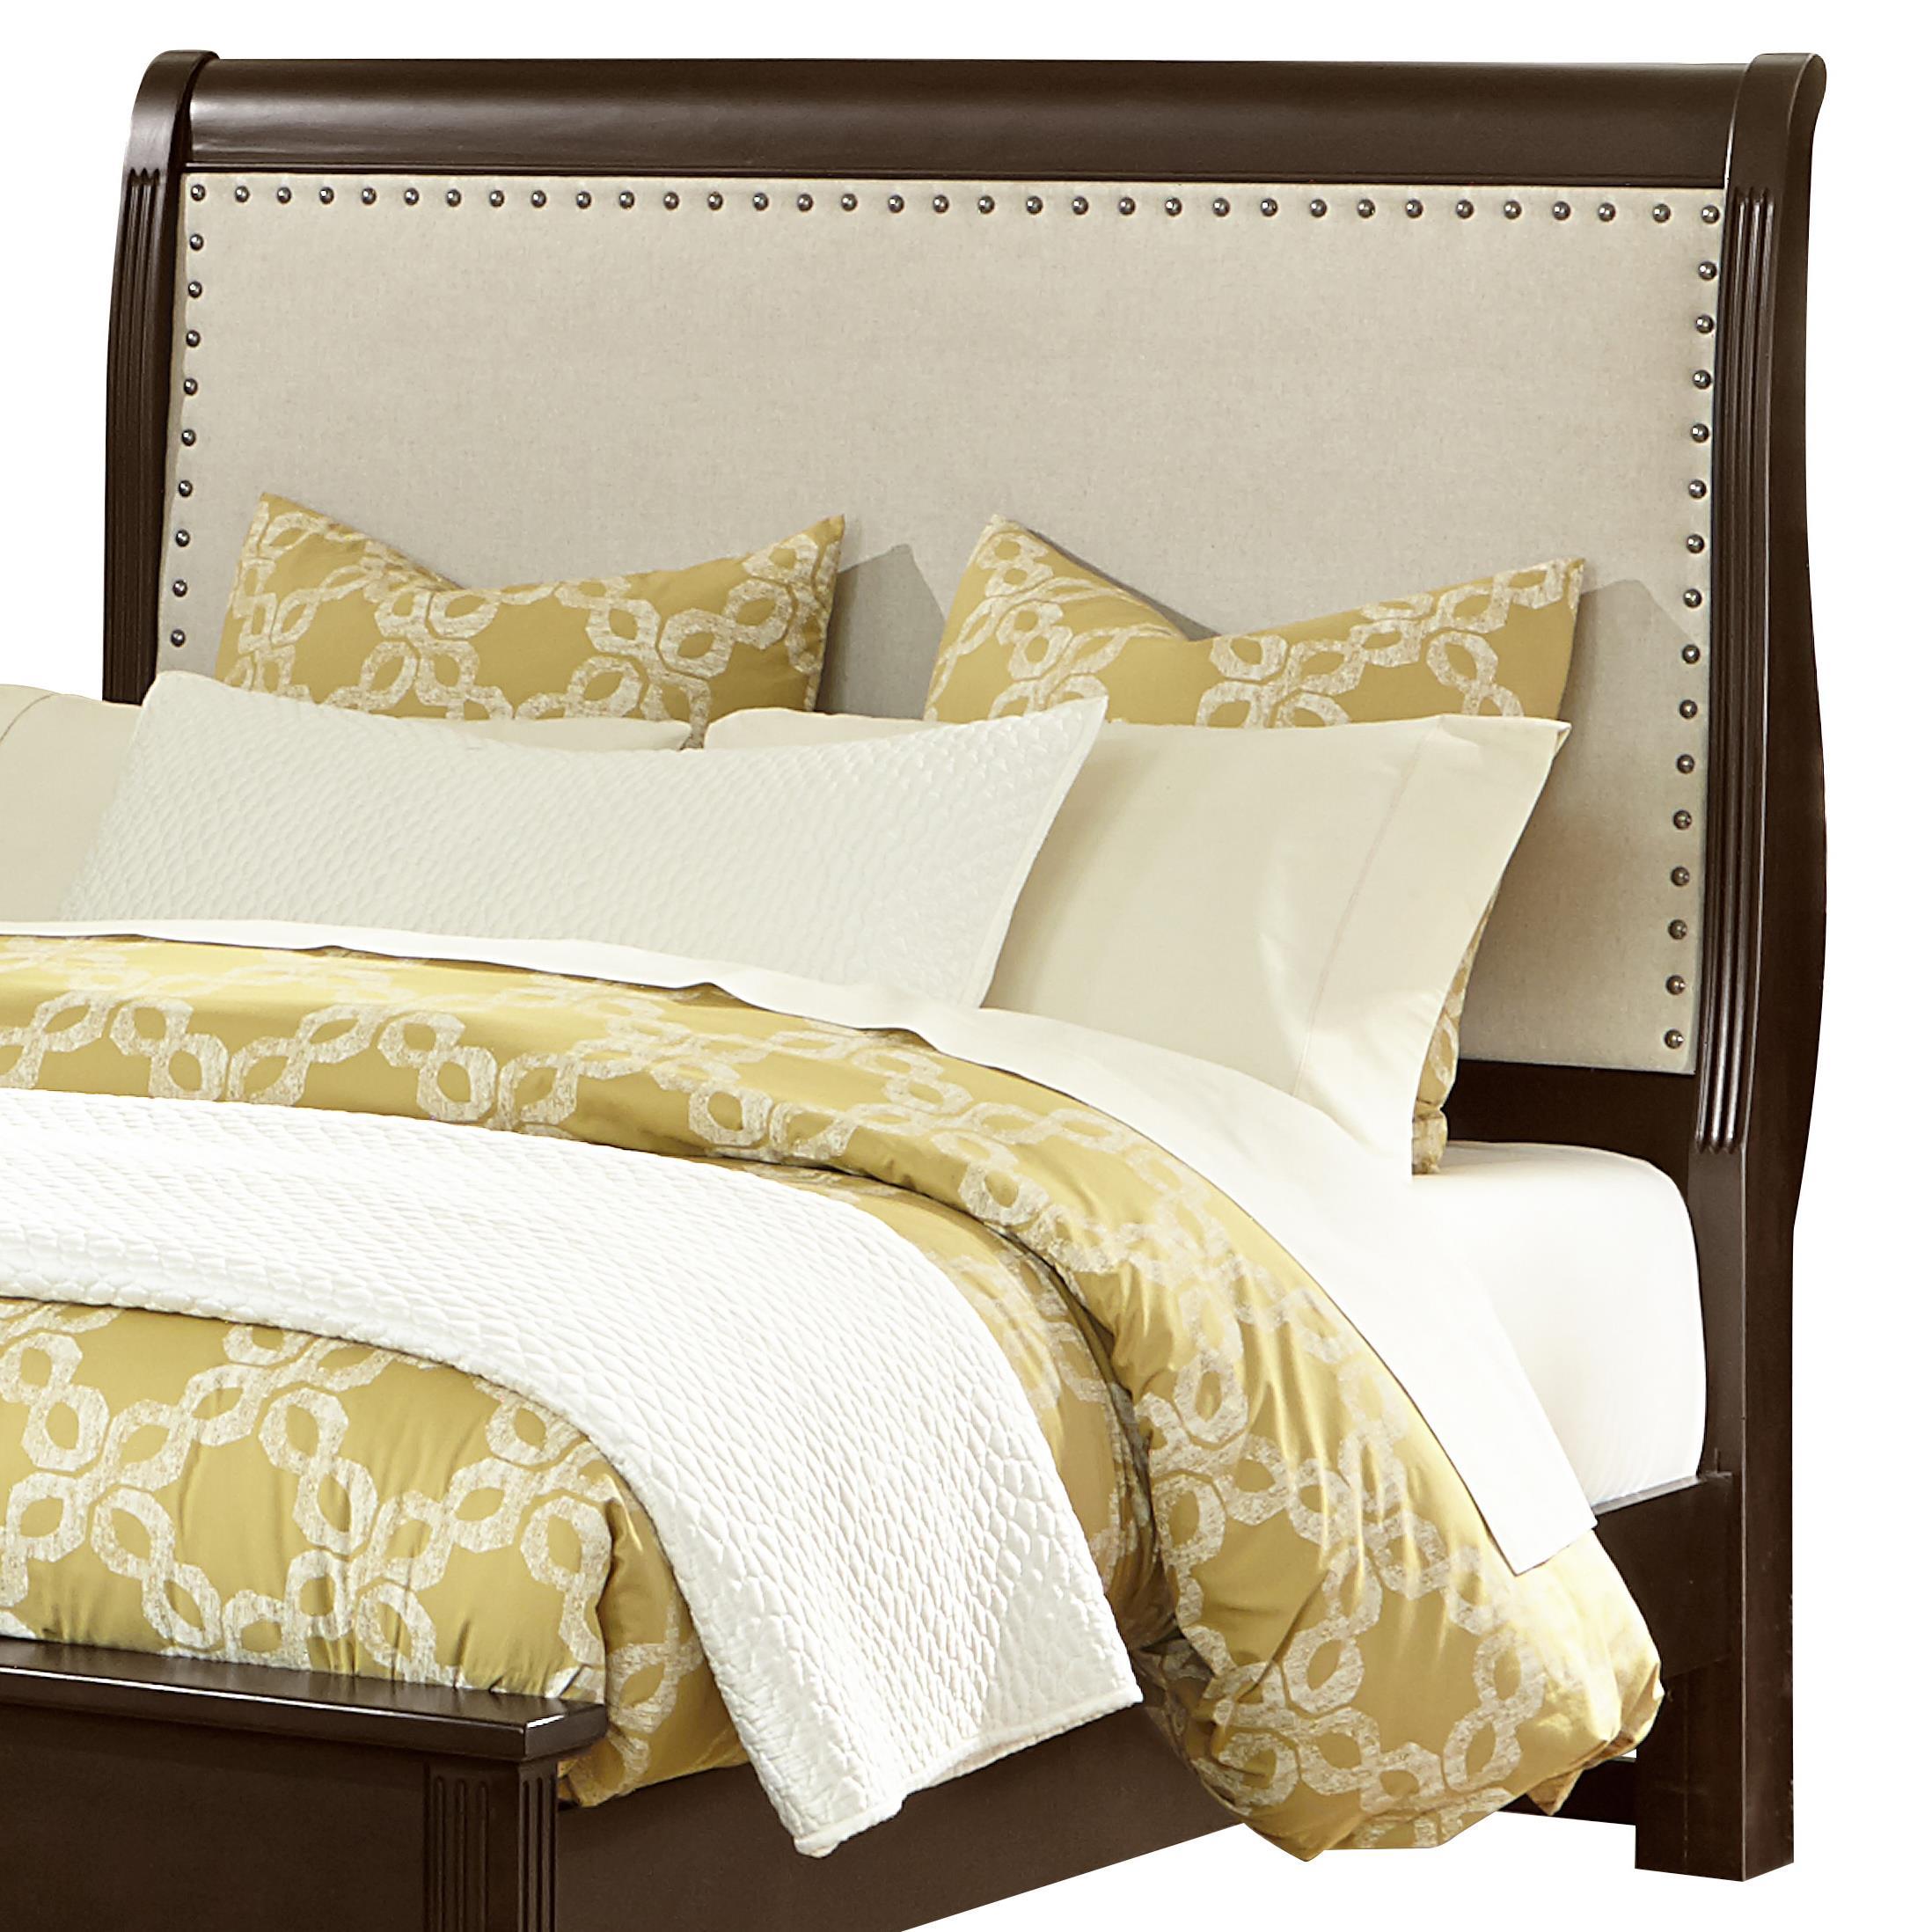 Twin Upholstered Headboard (Linen)